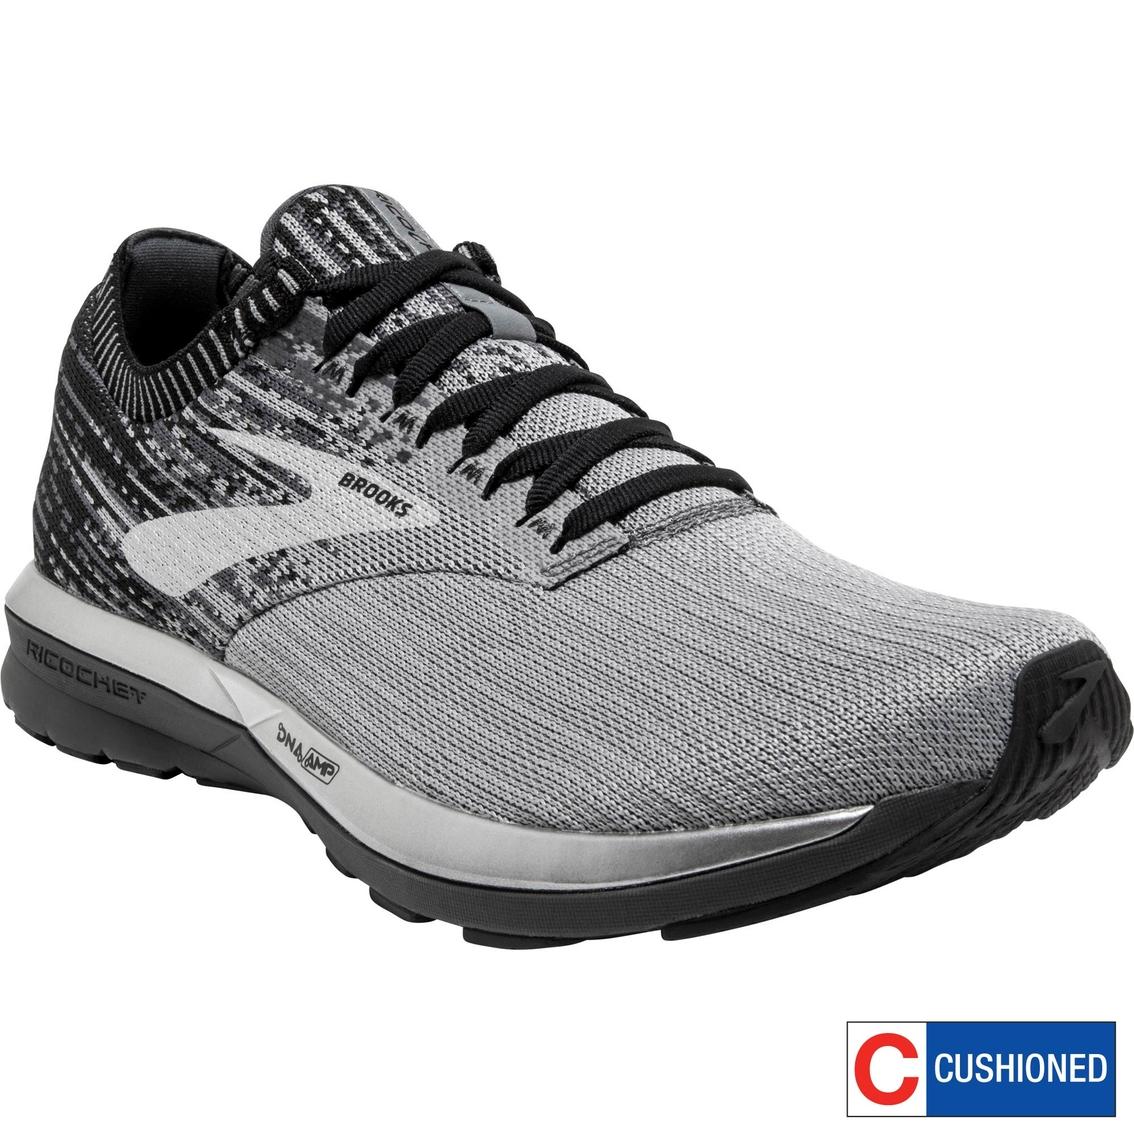 e1b428b0170 Brooks Men s Ricochet Running Shoes